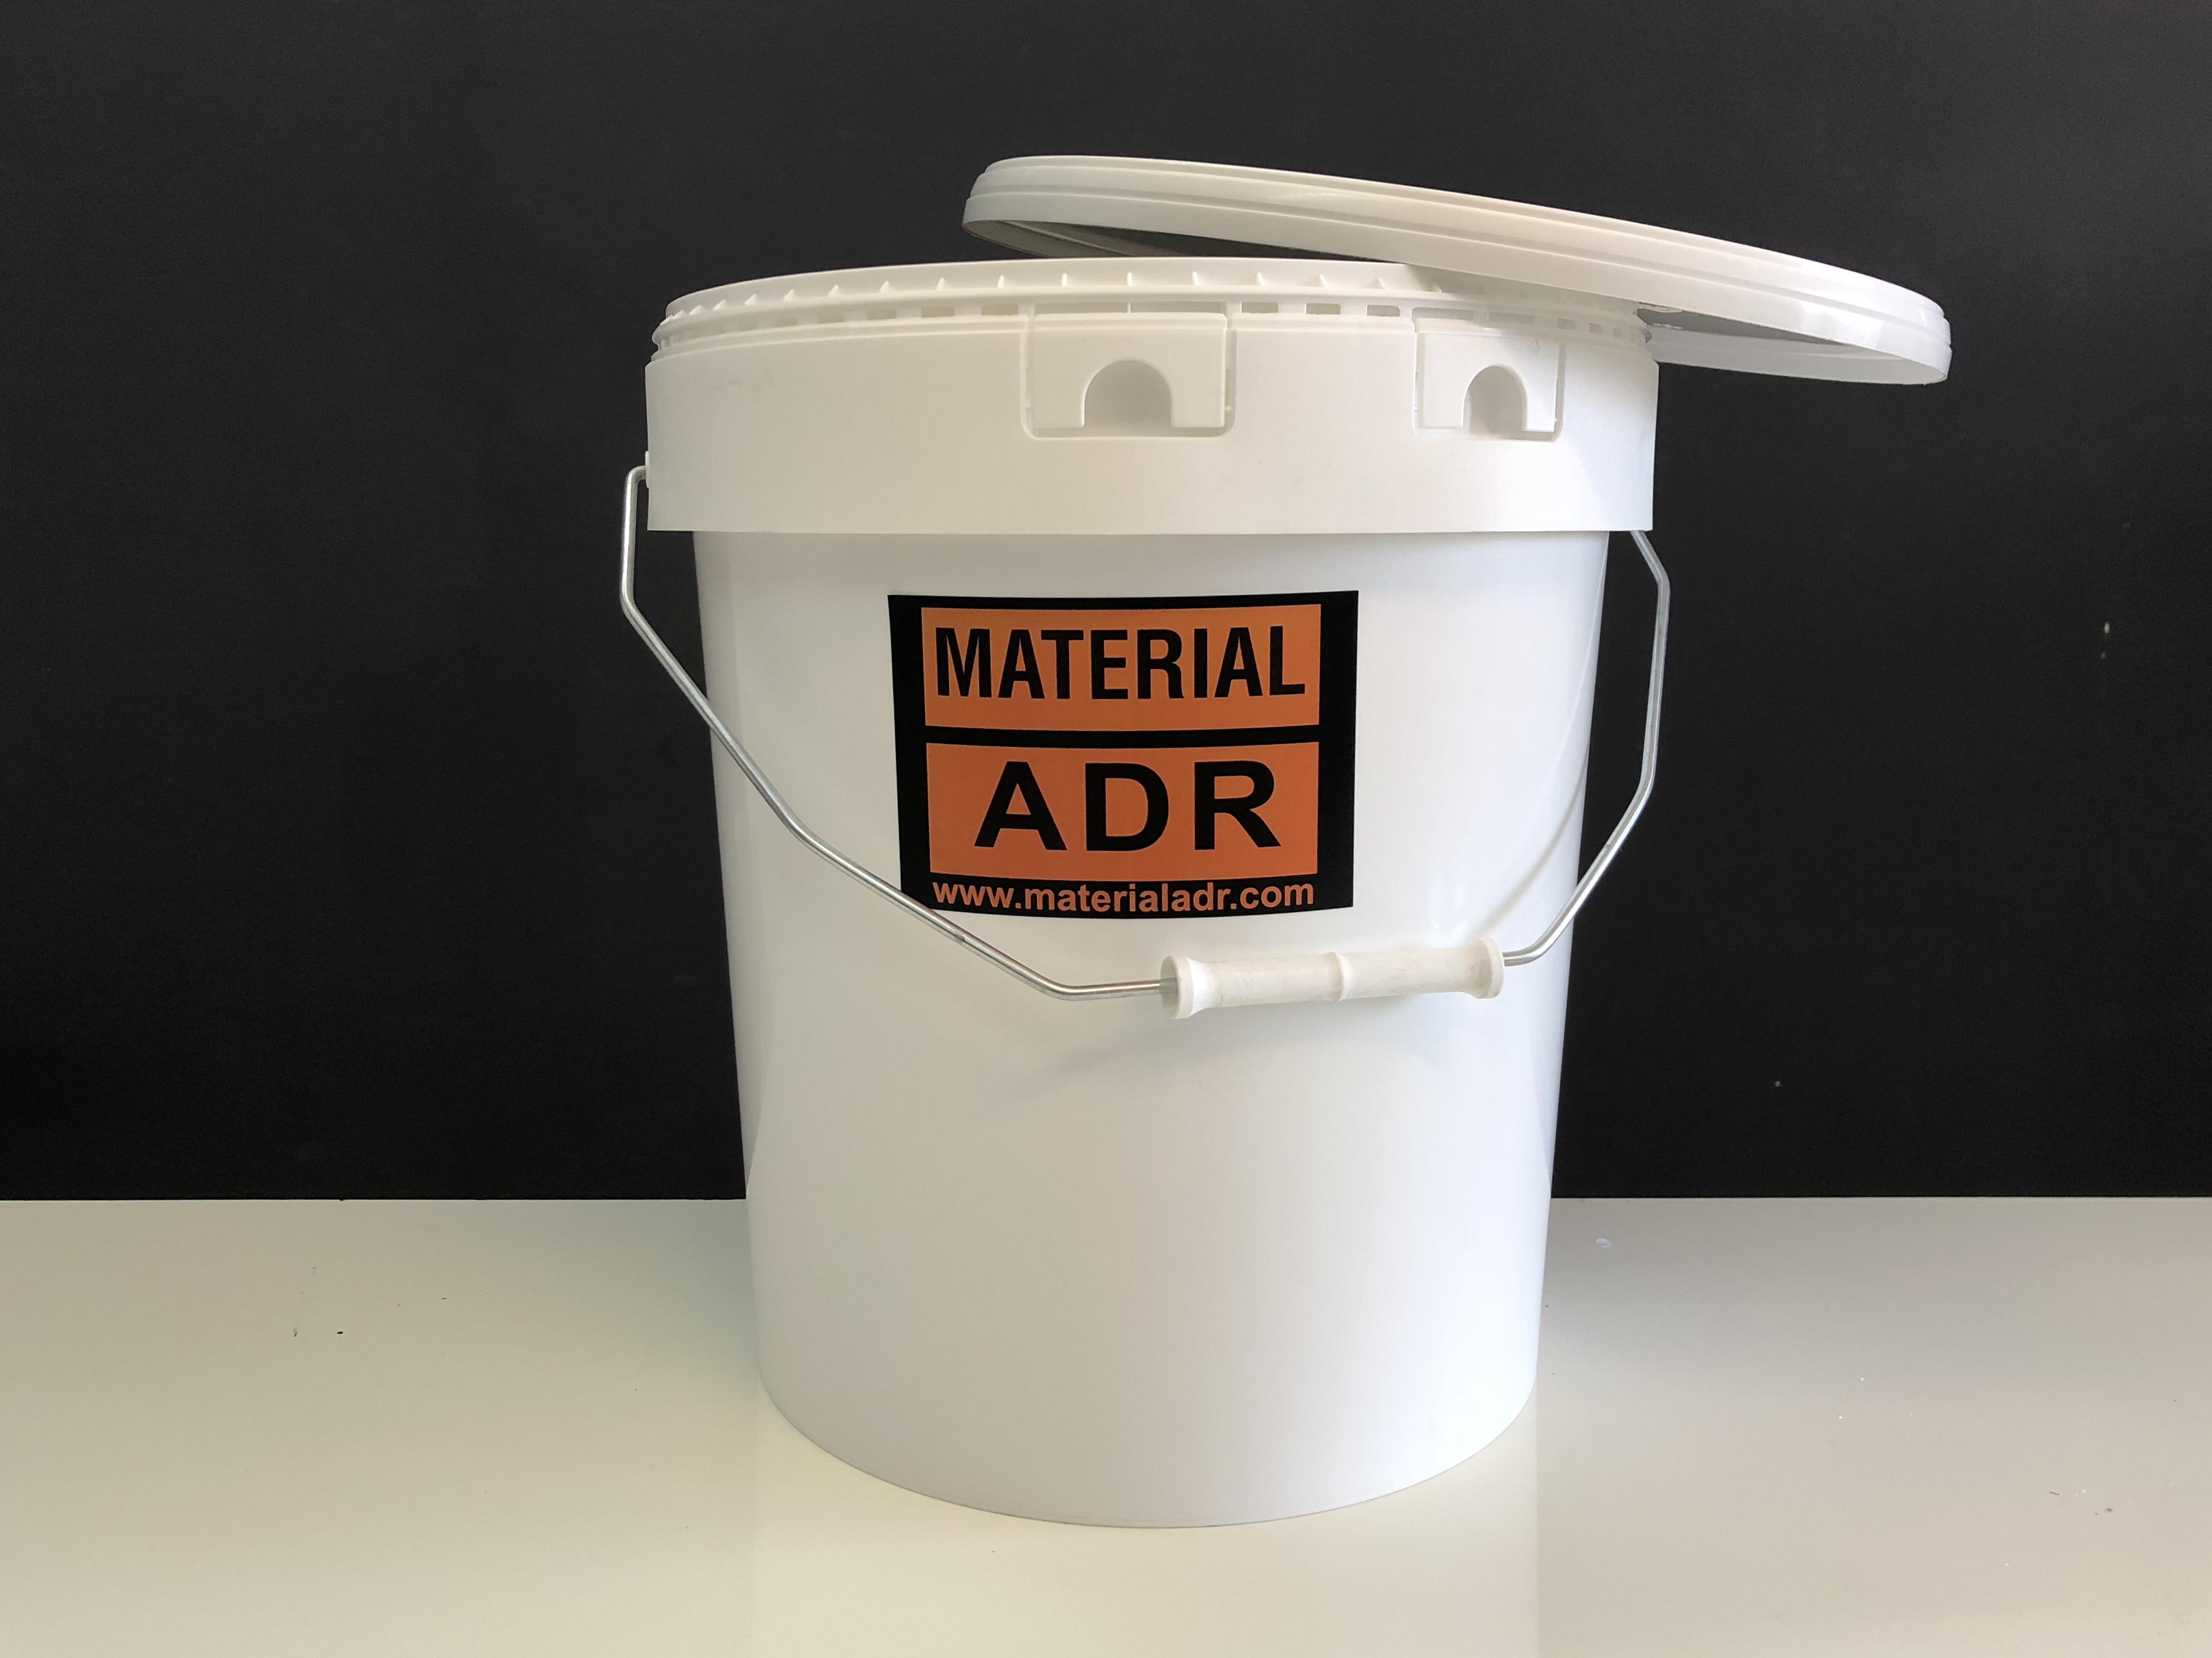 Kit ADR Online cubo ADR